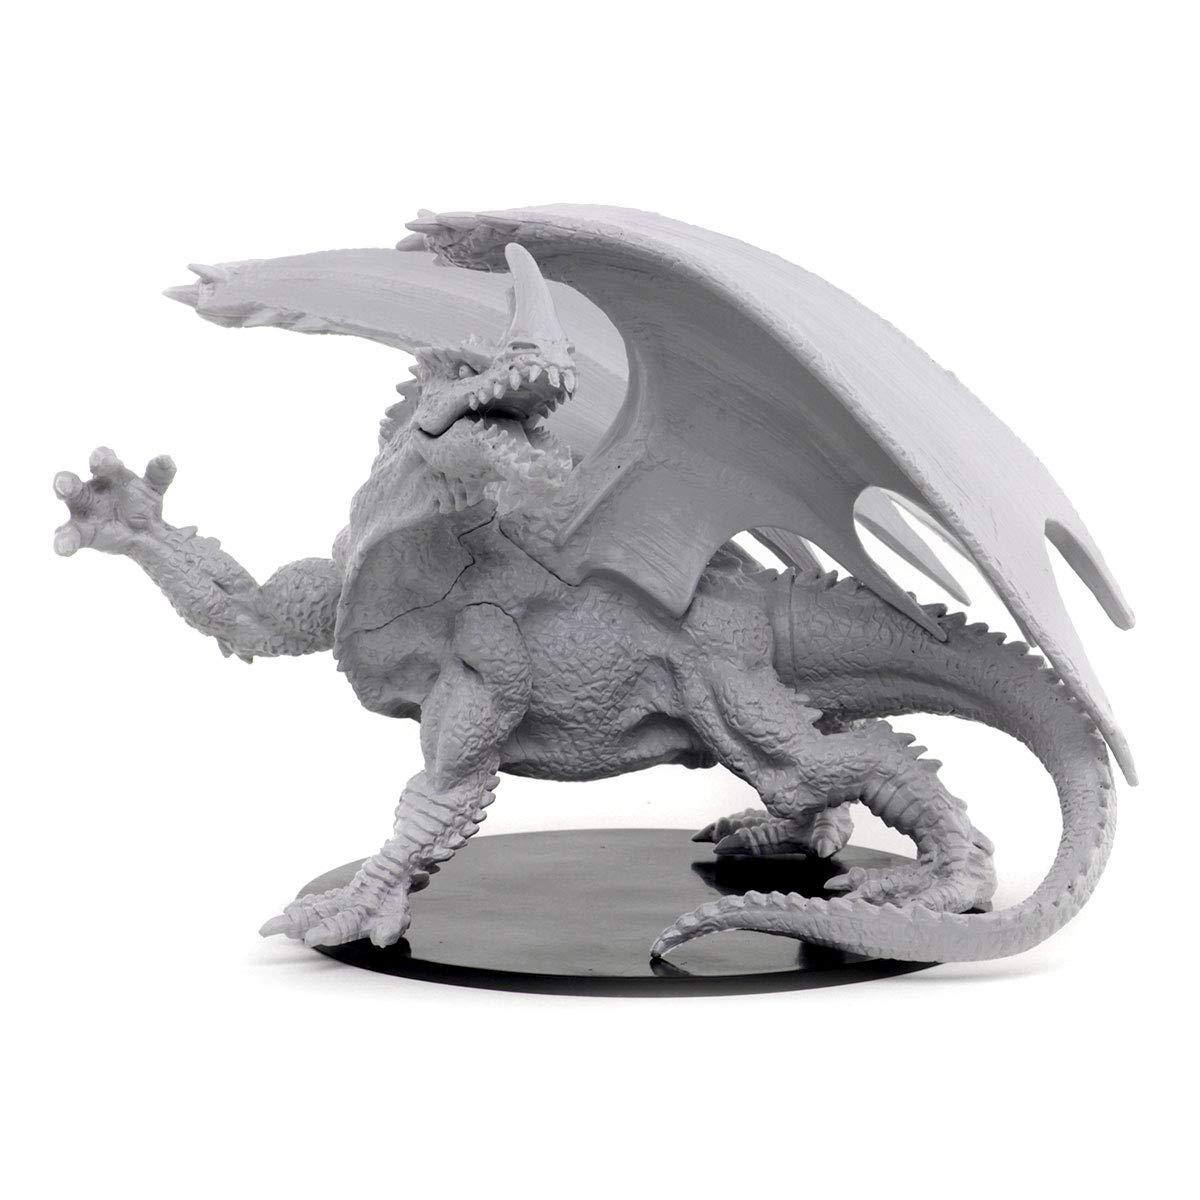 WizKids Pathfinder Deep Cuts Unpainted Miniatures Gargantuan Green Dragon Toy WZK73531